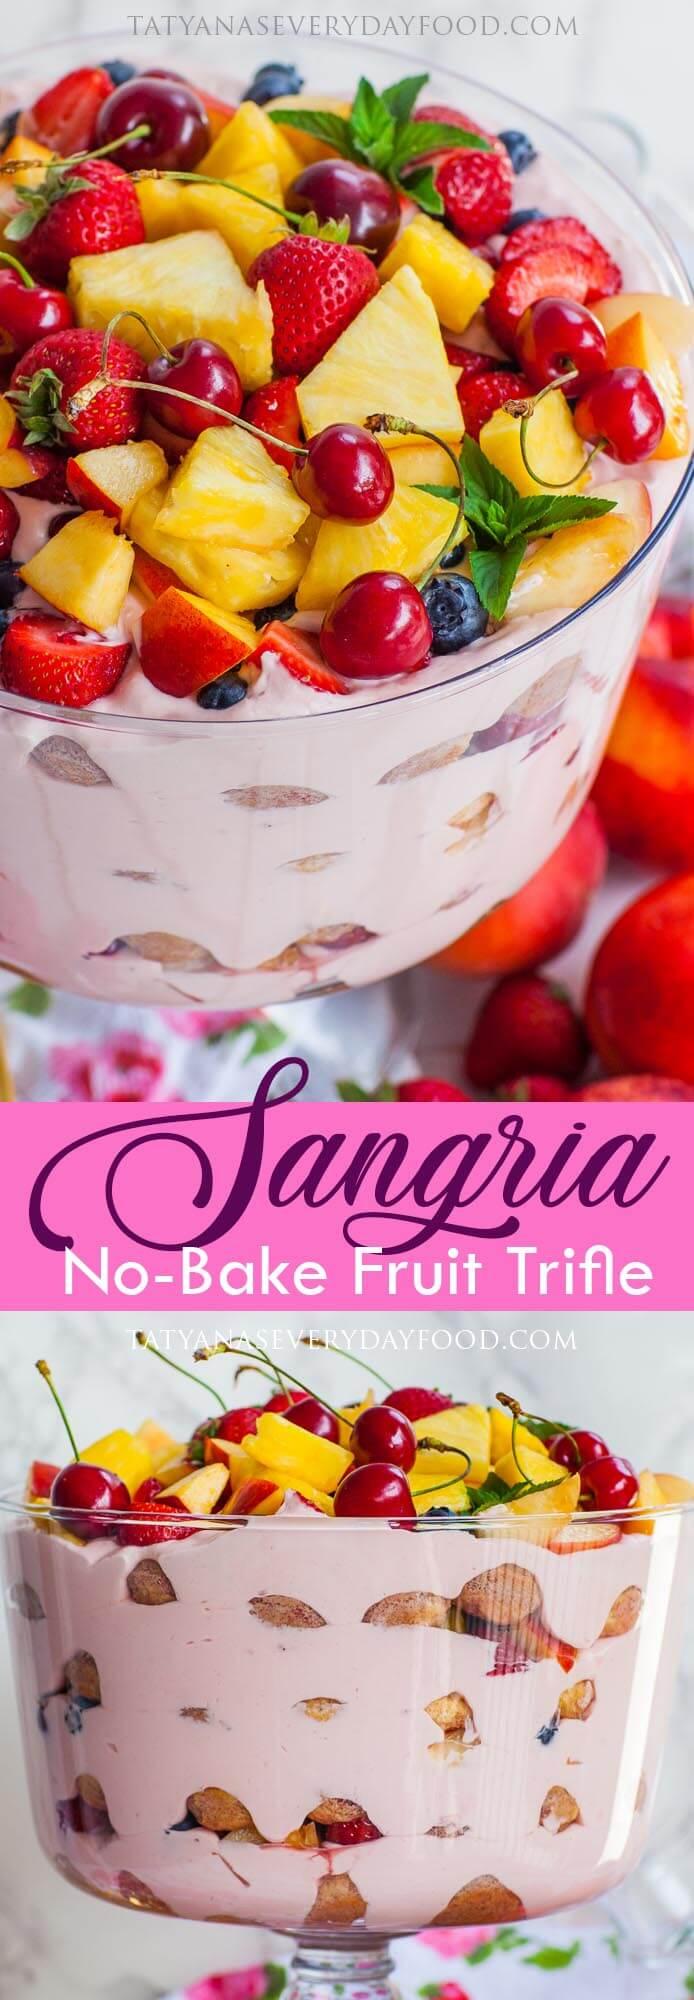 No-Bake Sangria Fruit Trifle video recipe